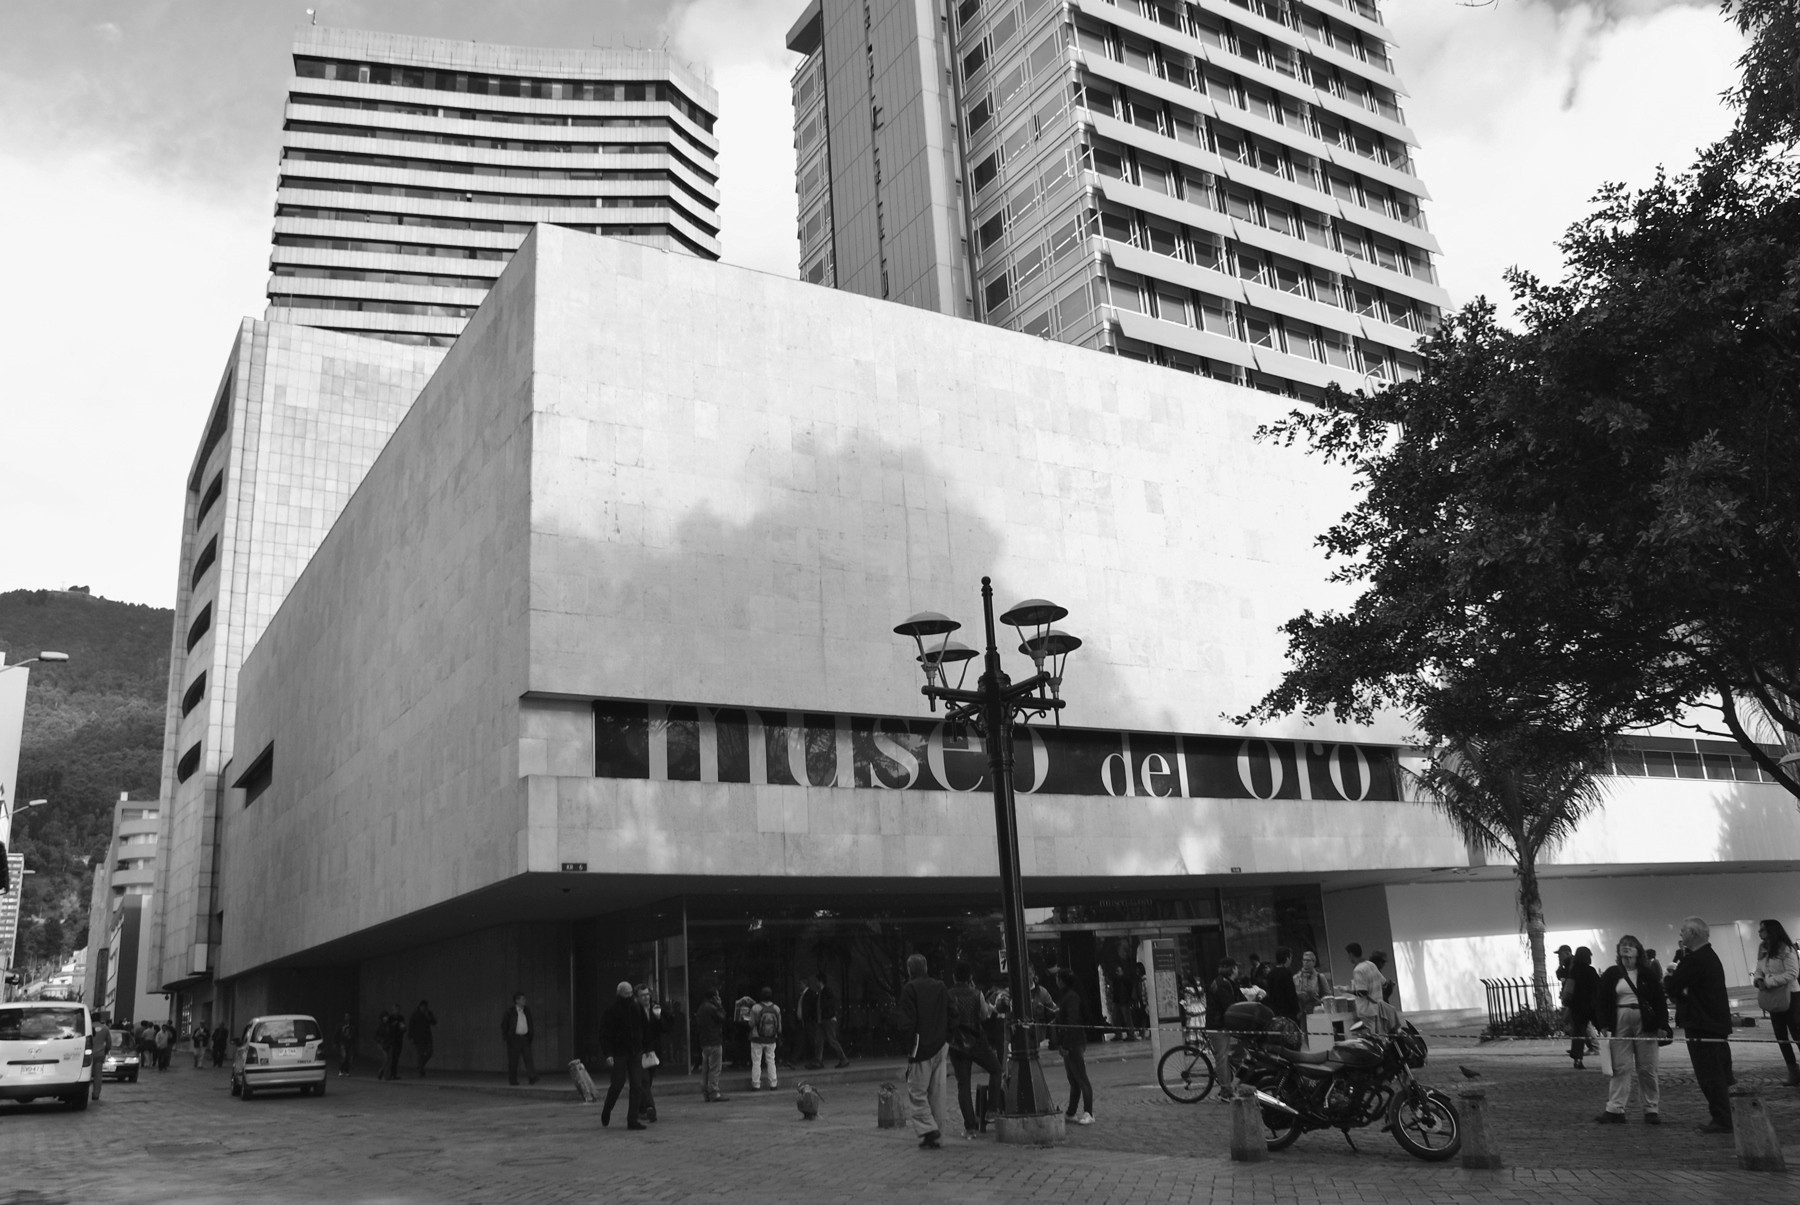 Clásicos de Arquitectura: Museo del Oro / Germán Samper, © Dan Gamboa Bohórquez